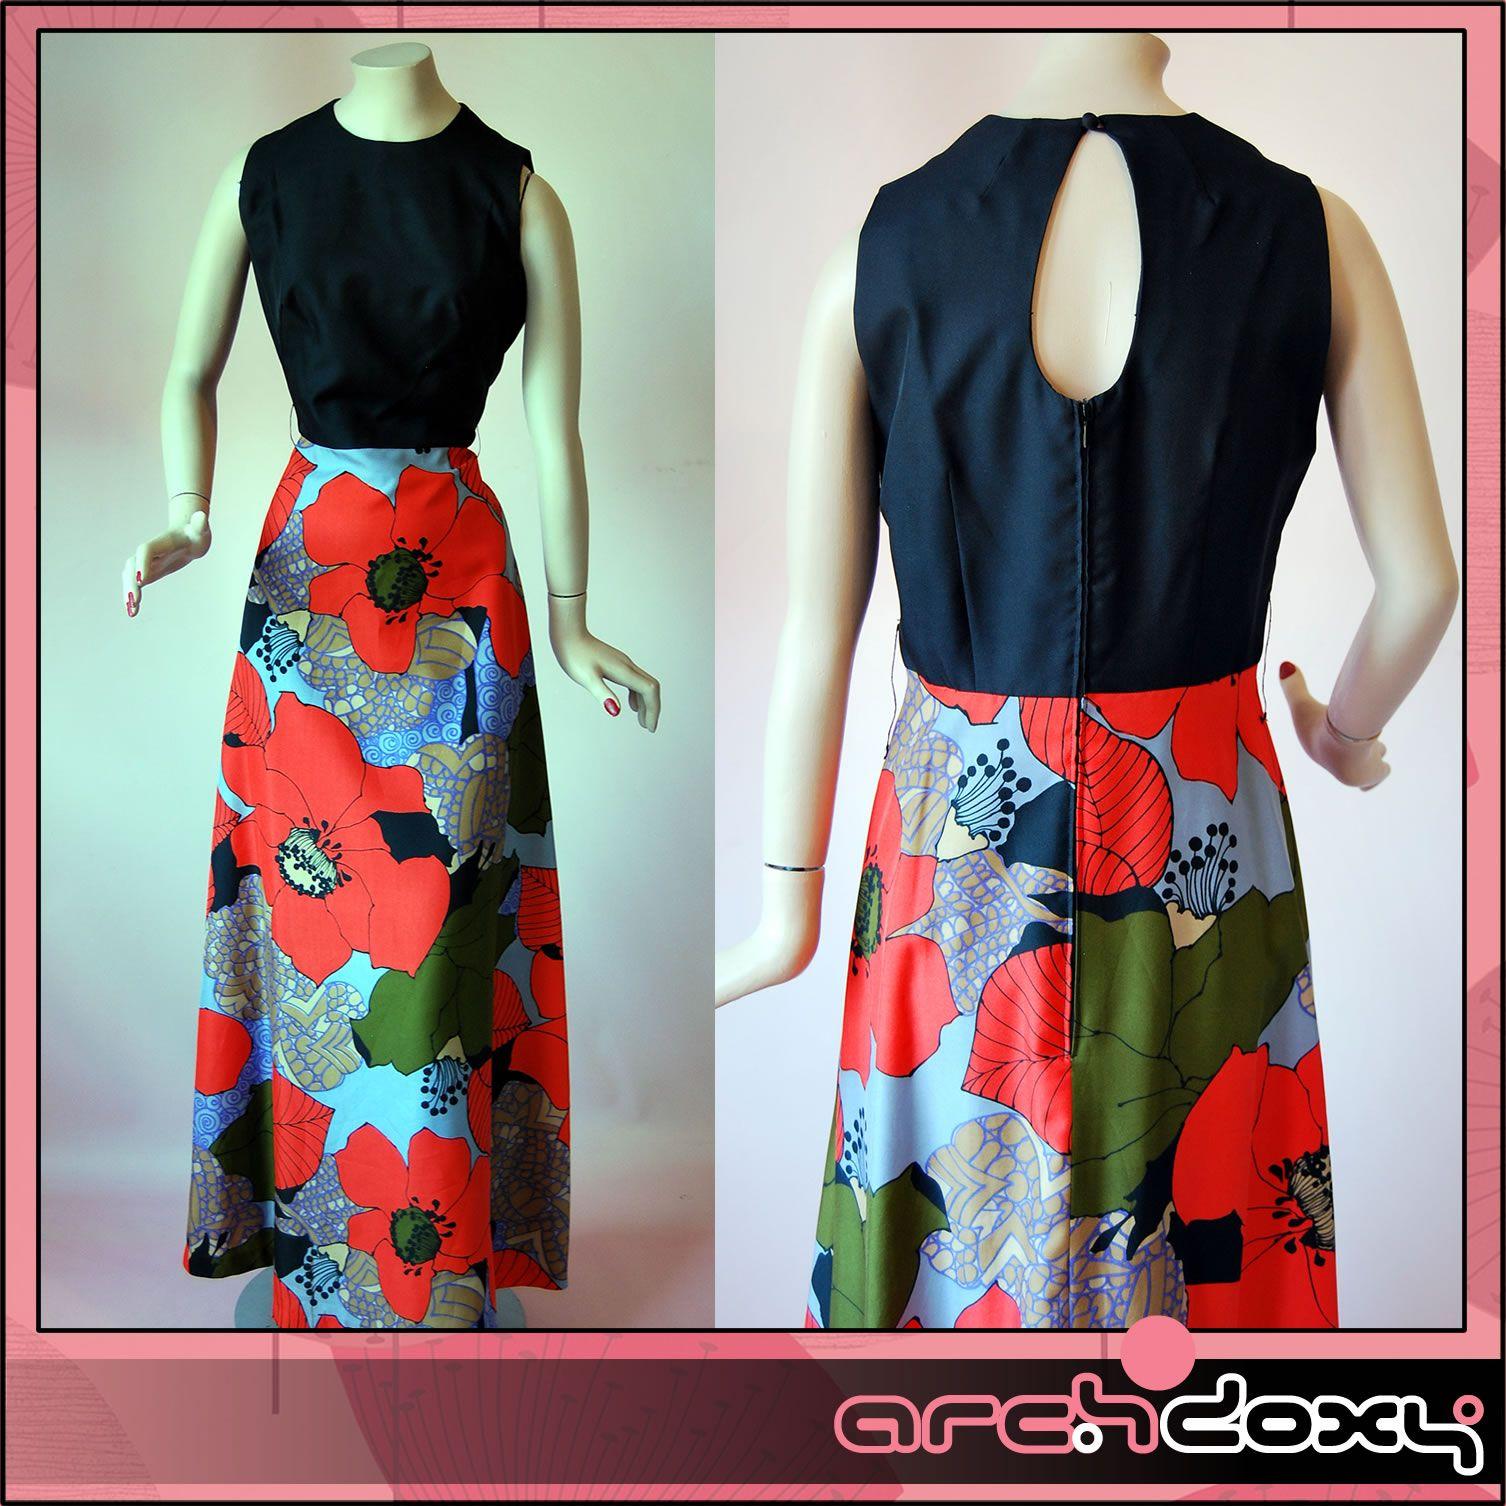 Vintage 1960s Outstanding Huge Poppy Print Cut Out Back MOD Maxi SKA Dress #vintage #mod  http://www.ebay.co.uk/itm/Vintage-1960s-Outstanding-Huge-Poppy-Print-Cut-Out-Back-MOD-Maxi-SKA-Dress-UK12-/371593257883?ssPageName=STRK:MESE:IT